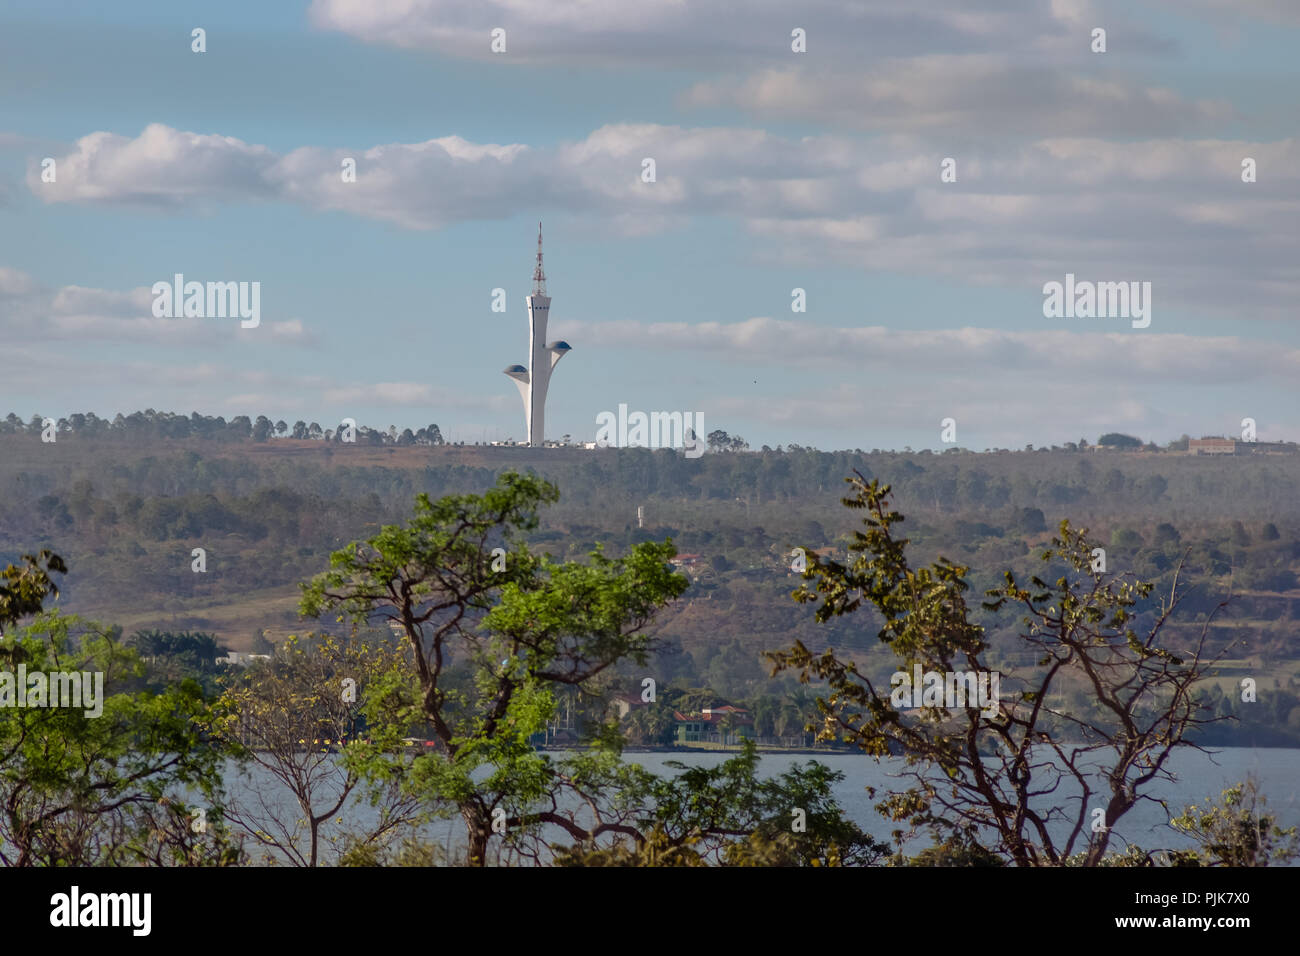 Digital Television Tower (Torre de TV Digital) - Brasilia, Distrito Federal, Brazil - Stock Image